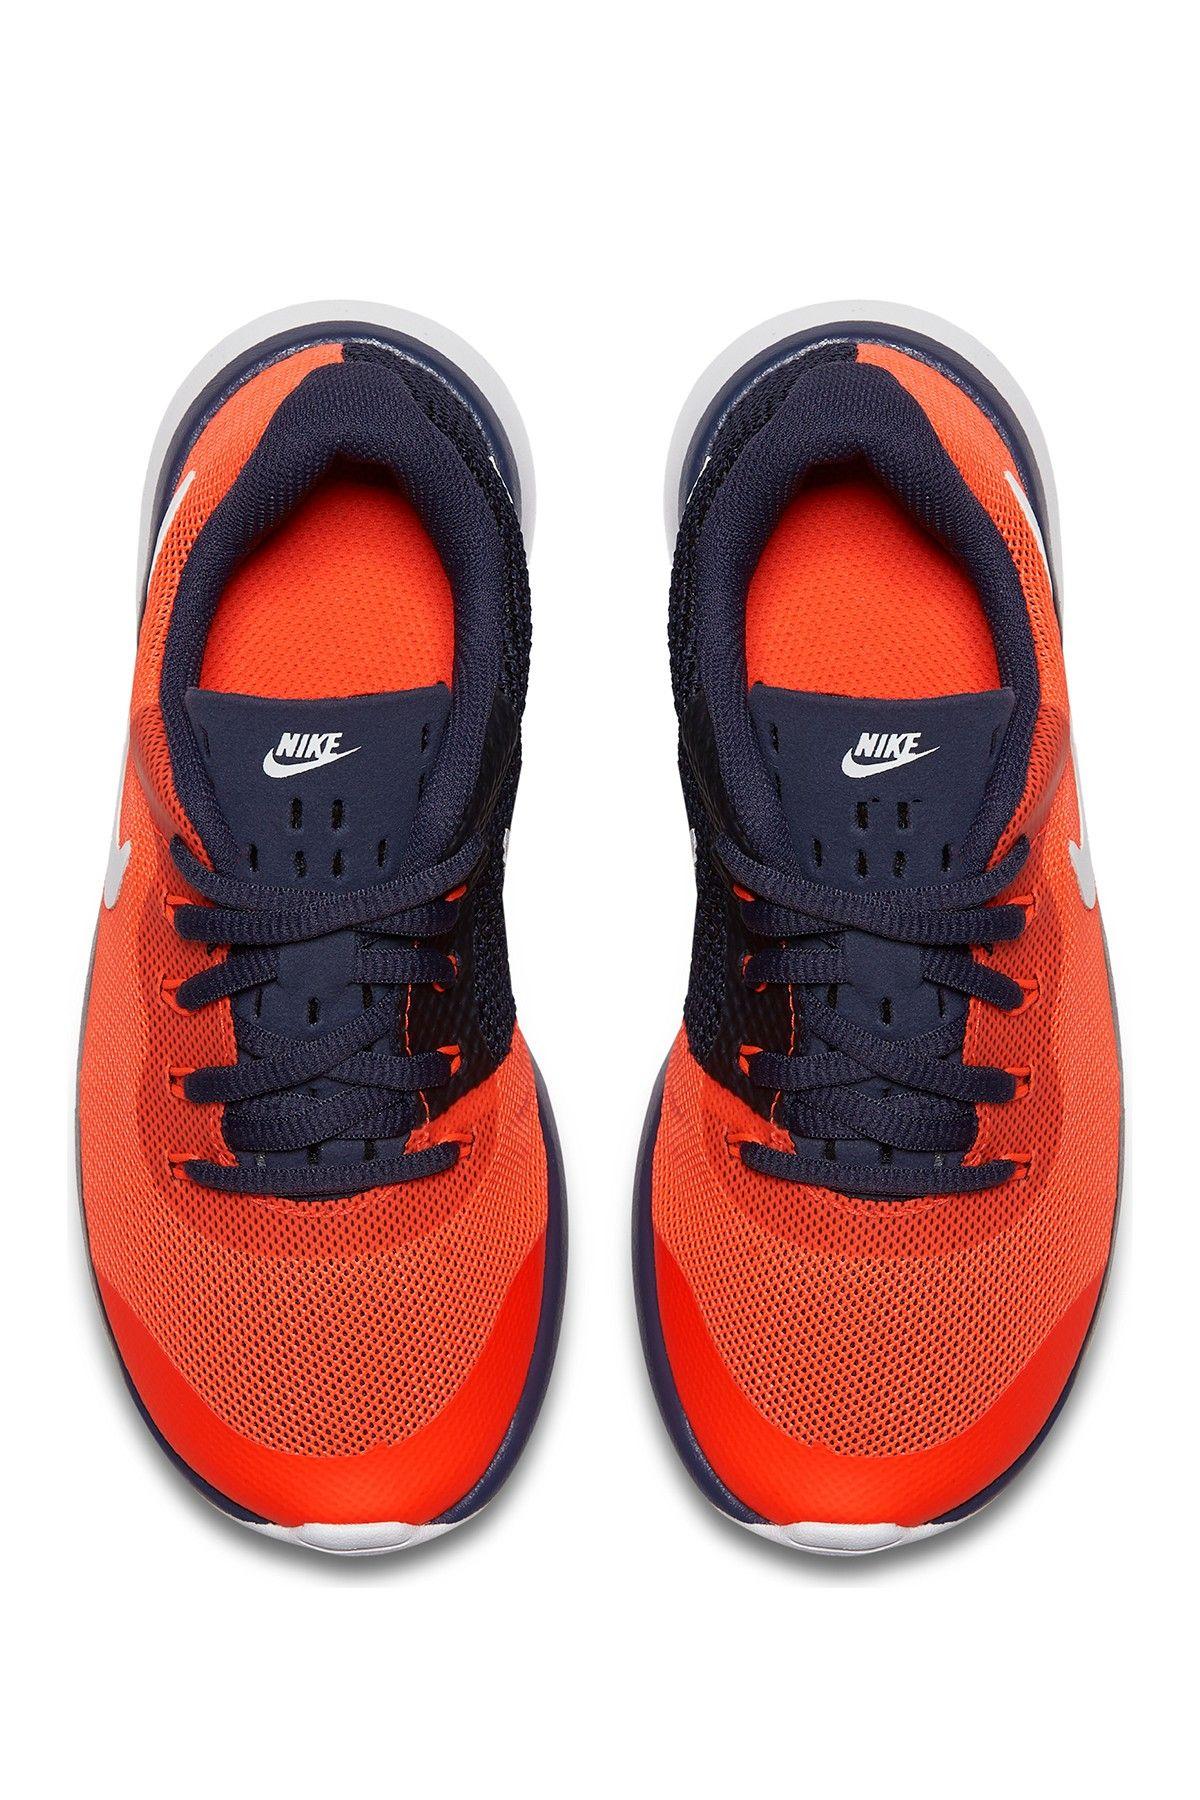 302b1bd179ebbf Tanjun Racer Sneaker (Little Kid) by Nike on  nordstrom rack